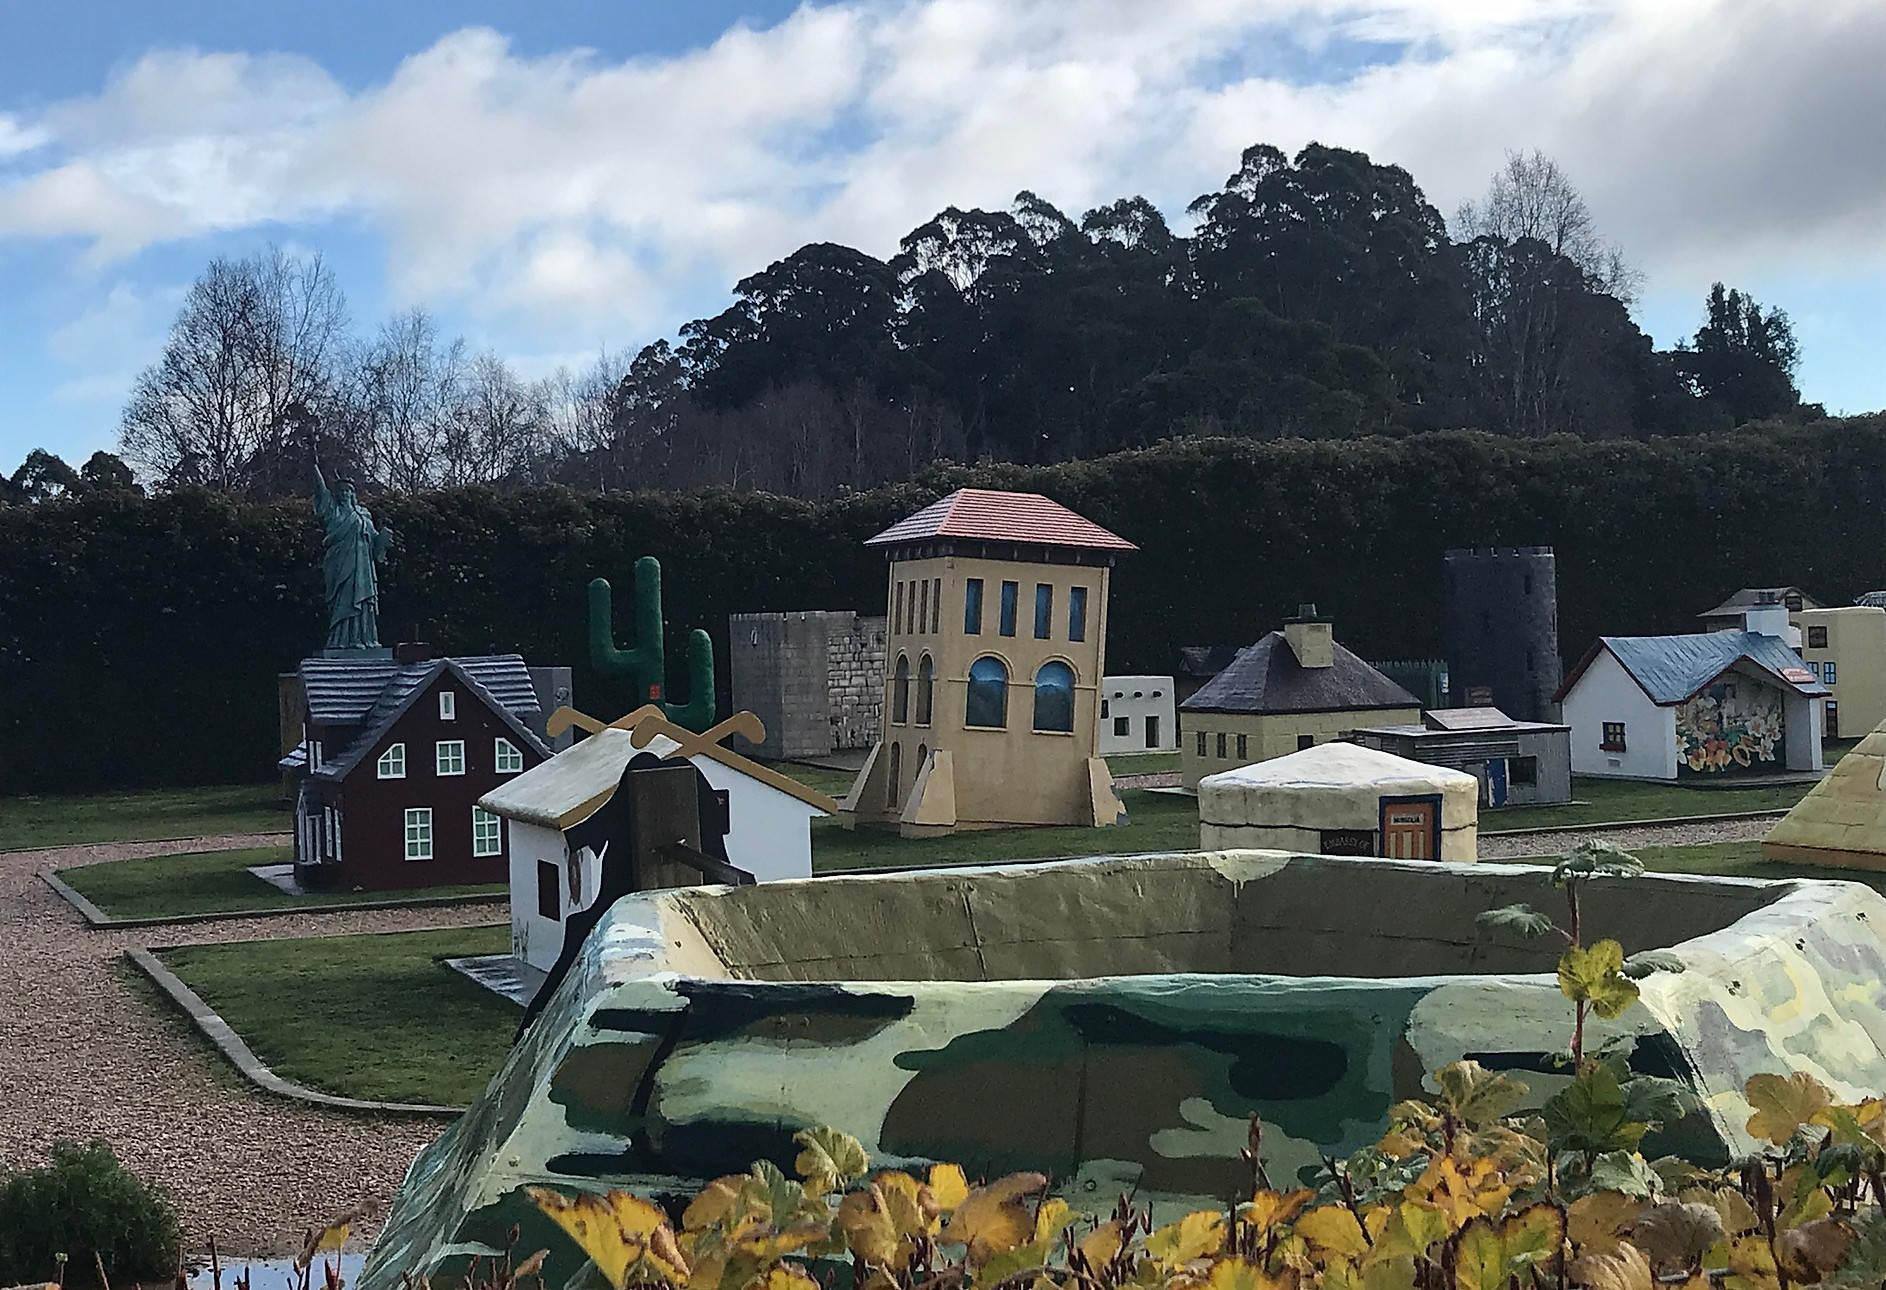 village of lower crackpot — Тасмания 2018 — Блог о путешествиях Сергея Чеботова